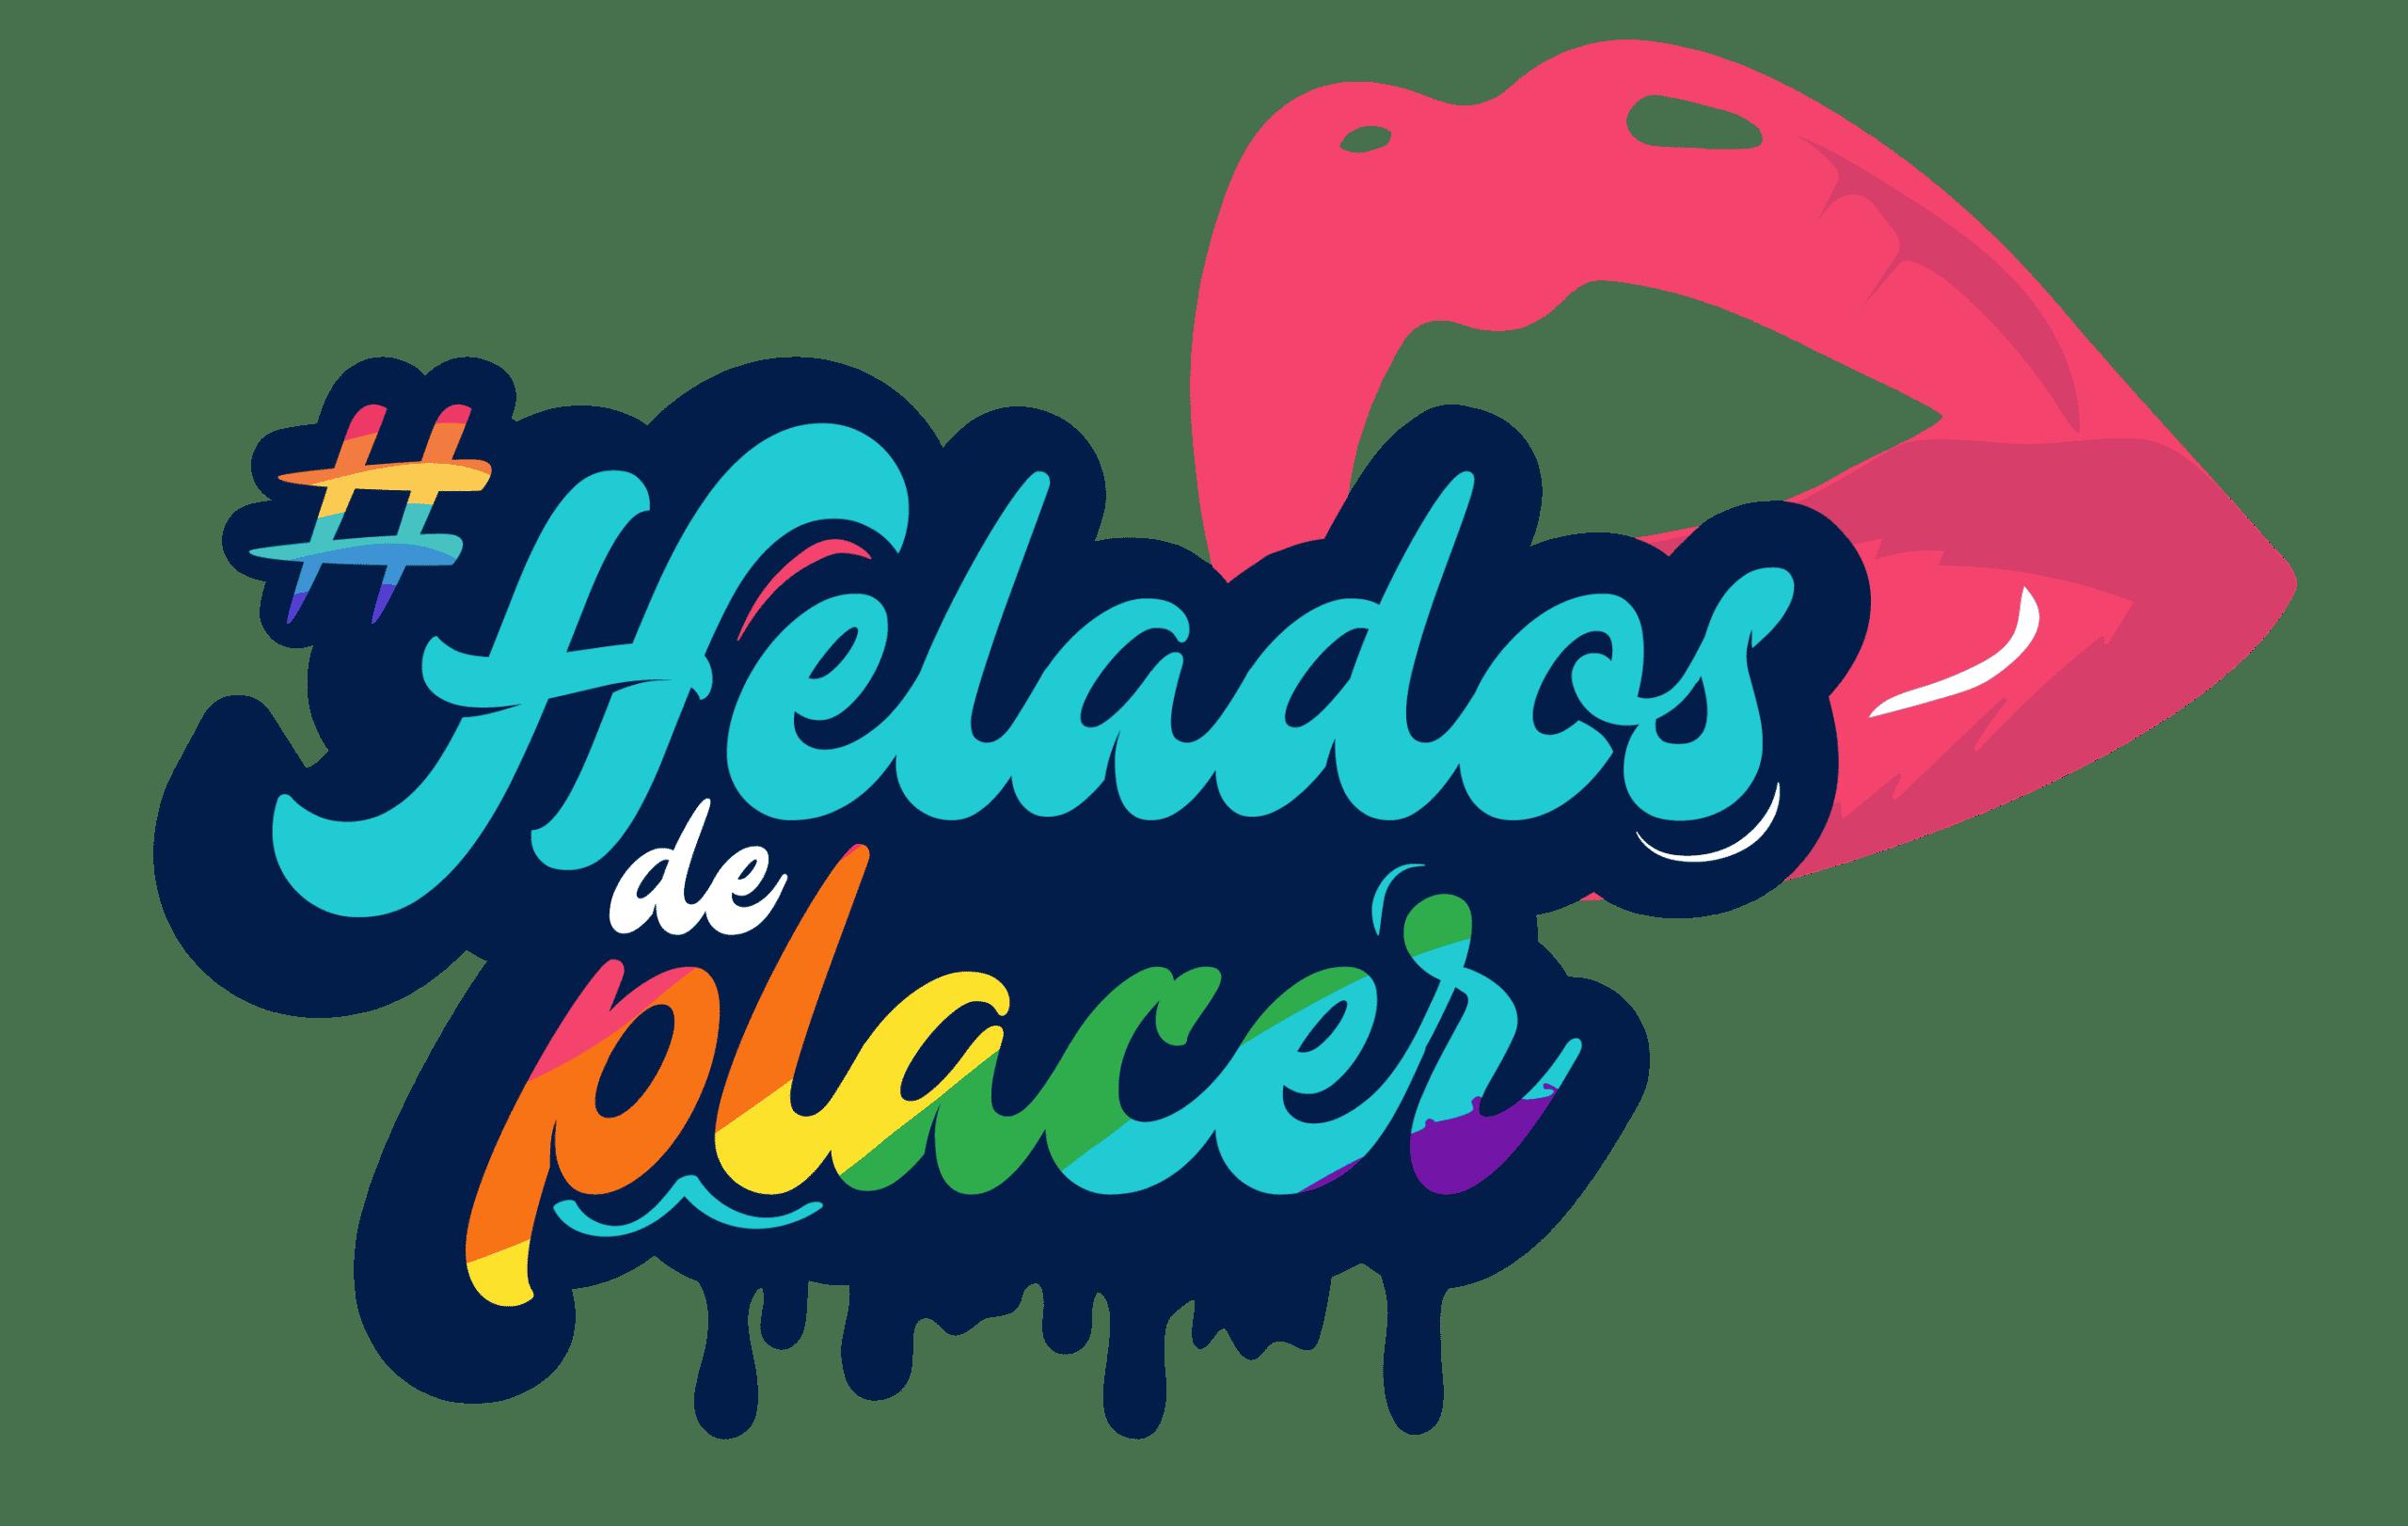 Helados-CHERISH